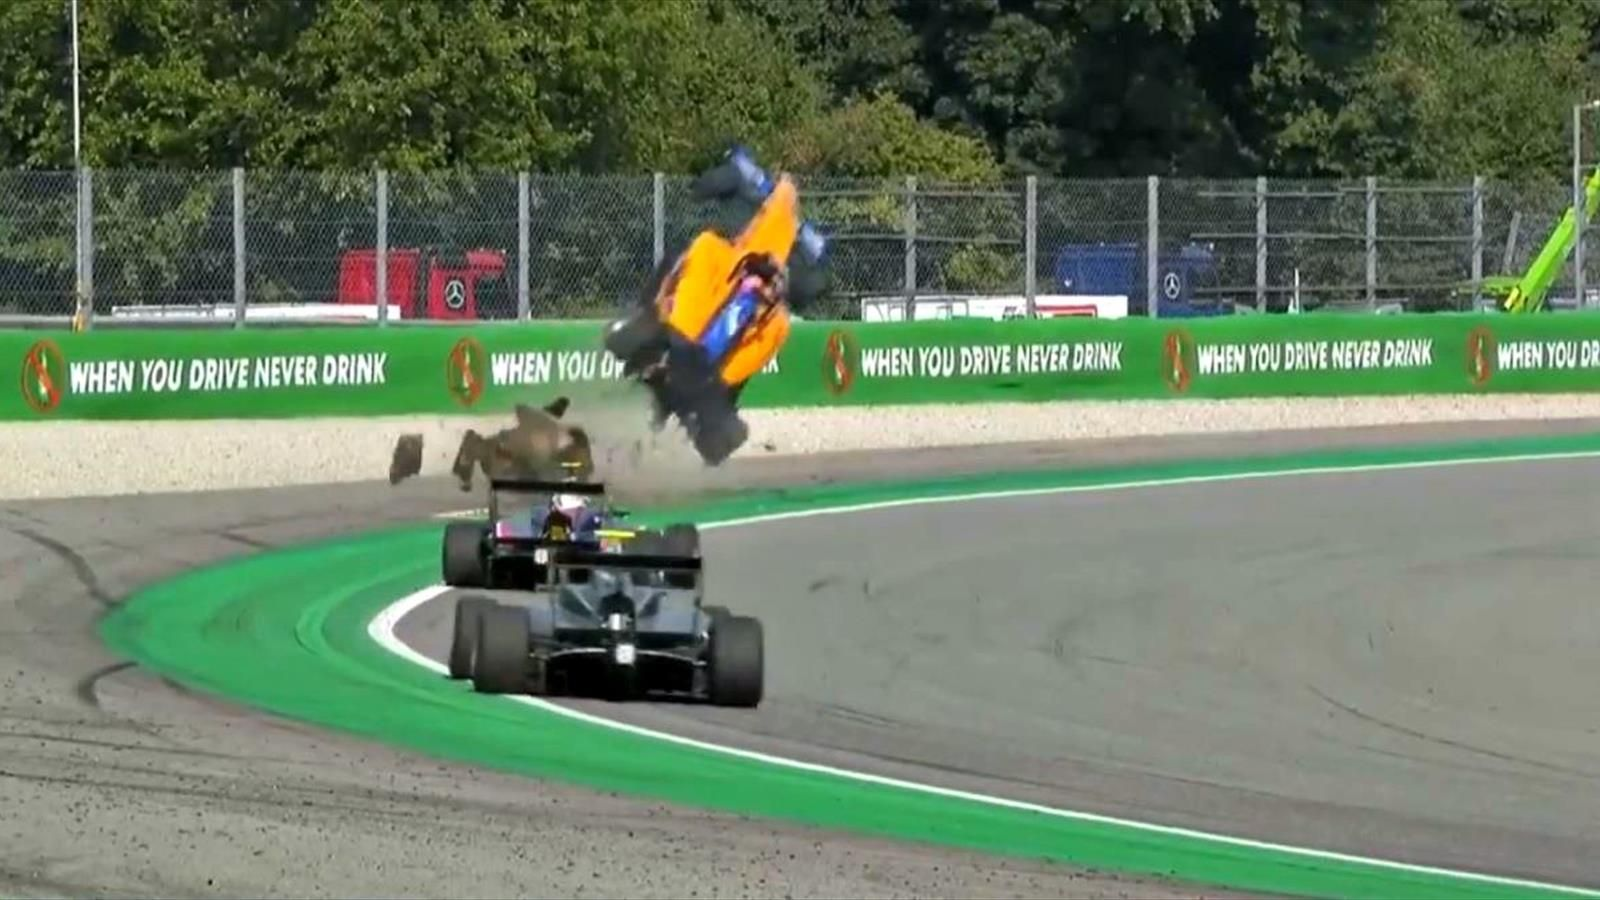 Sausage curb flips Alex Peroni's Formula car